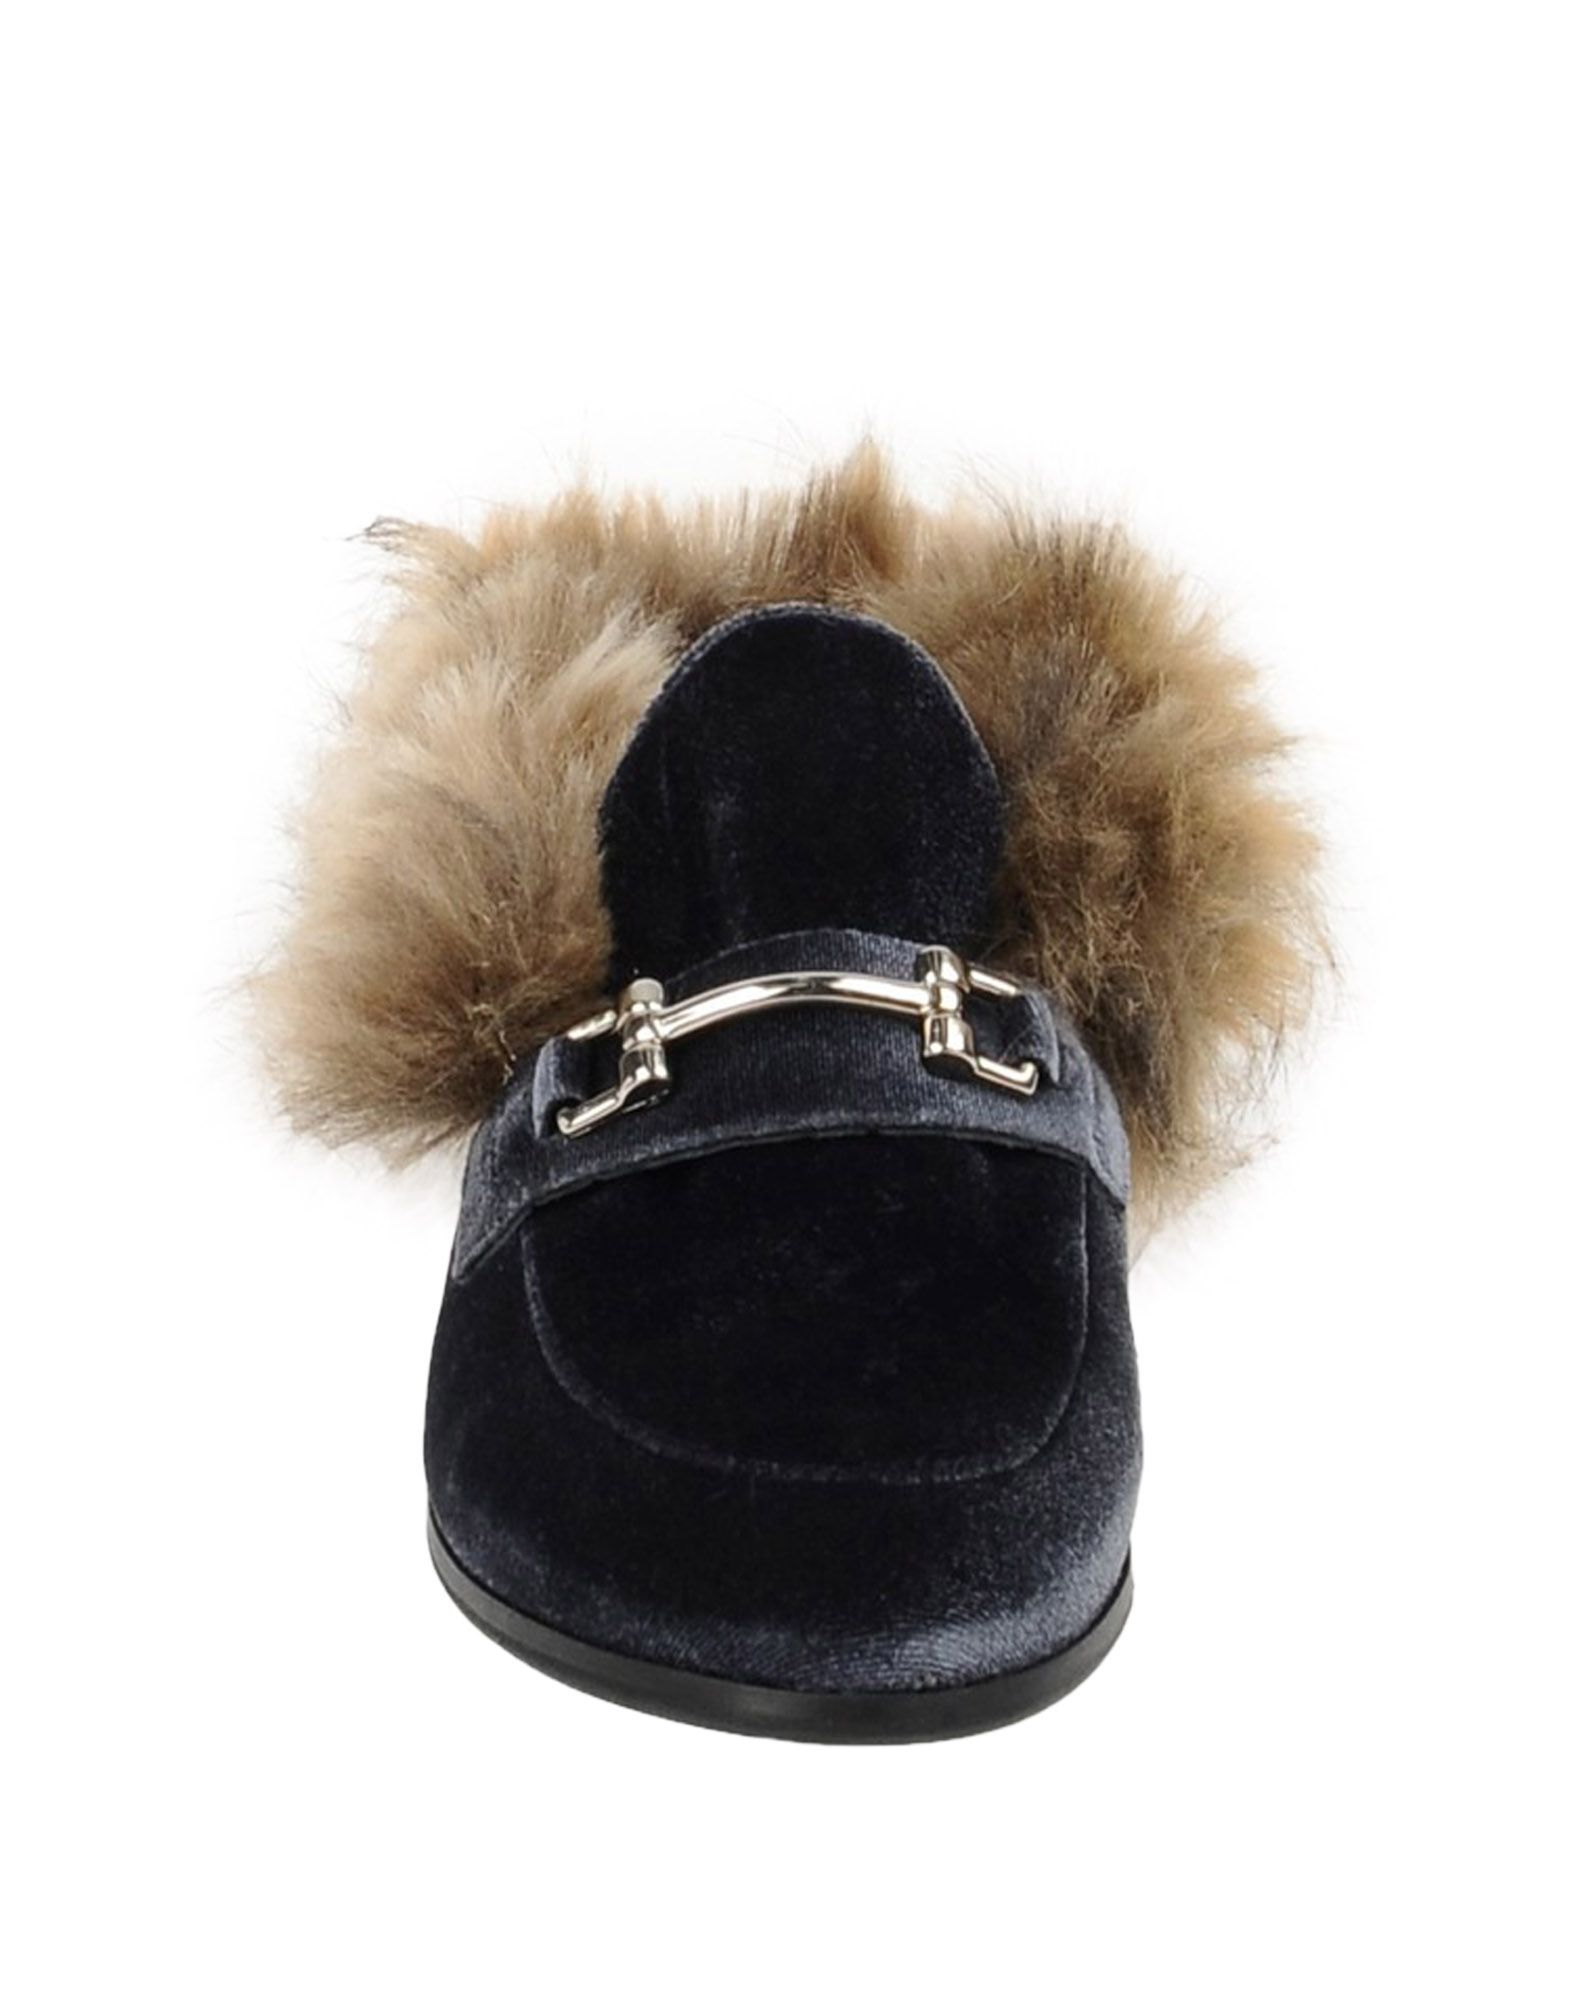 george j. adore ouvrir toe mules - toe femmes george j. adore ouvrir toe - mules en ligne le royaume - uni - 11383004vf 07fb19